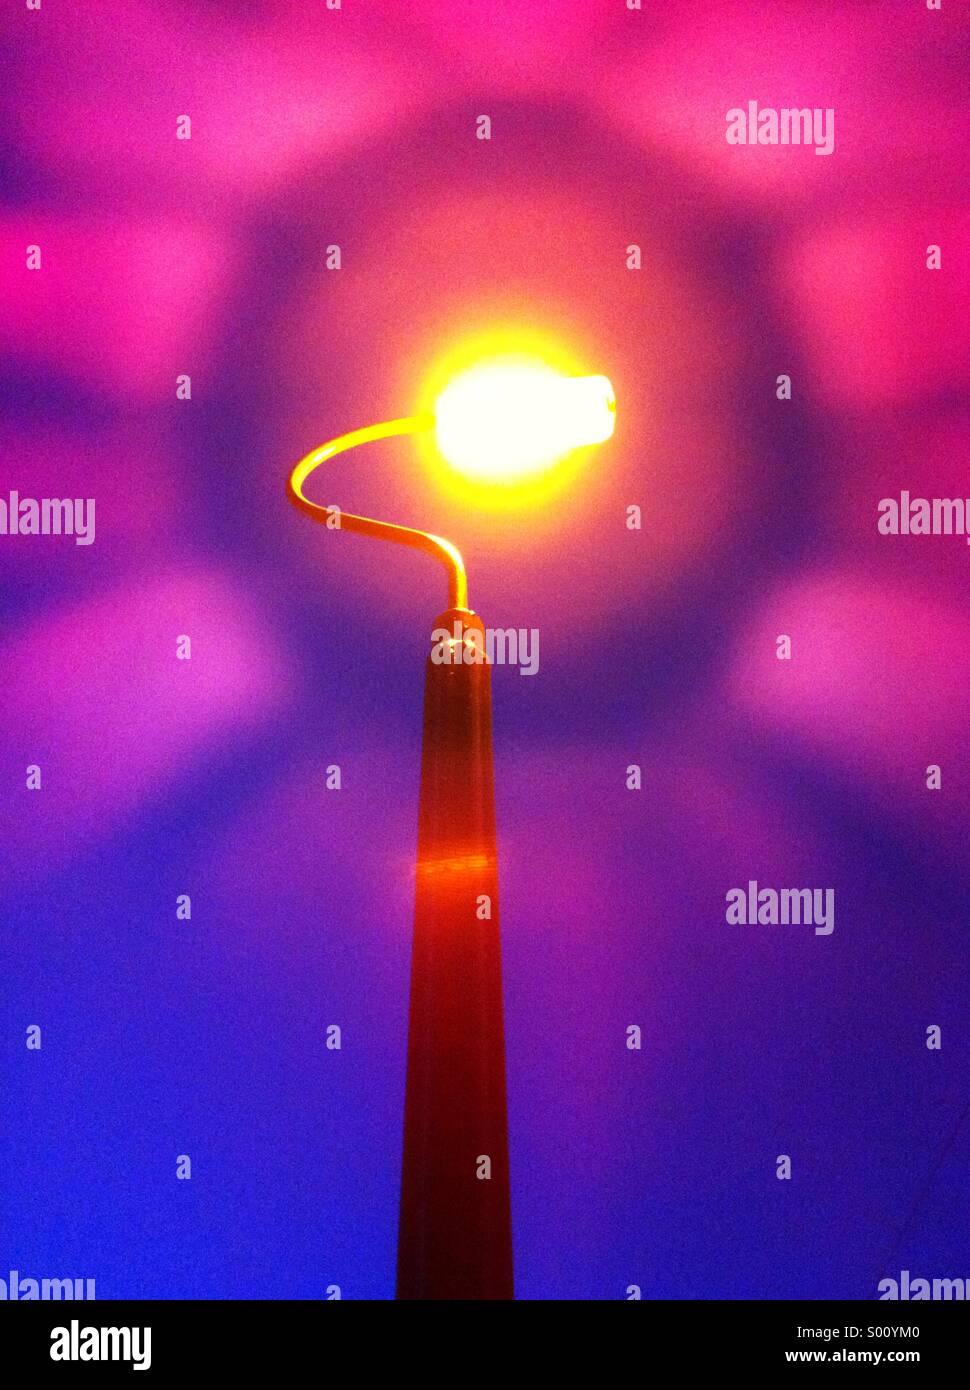 Pink light flare - Stock Image